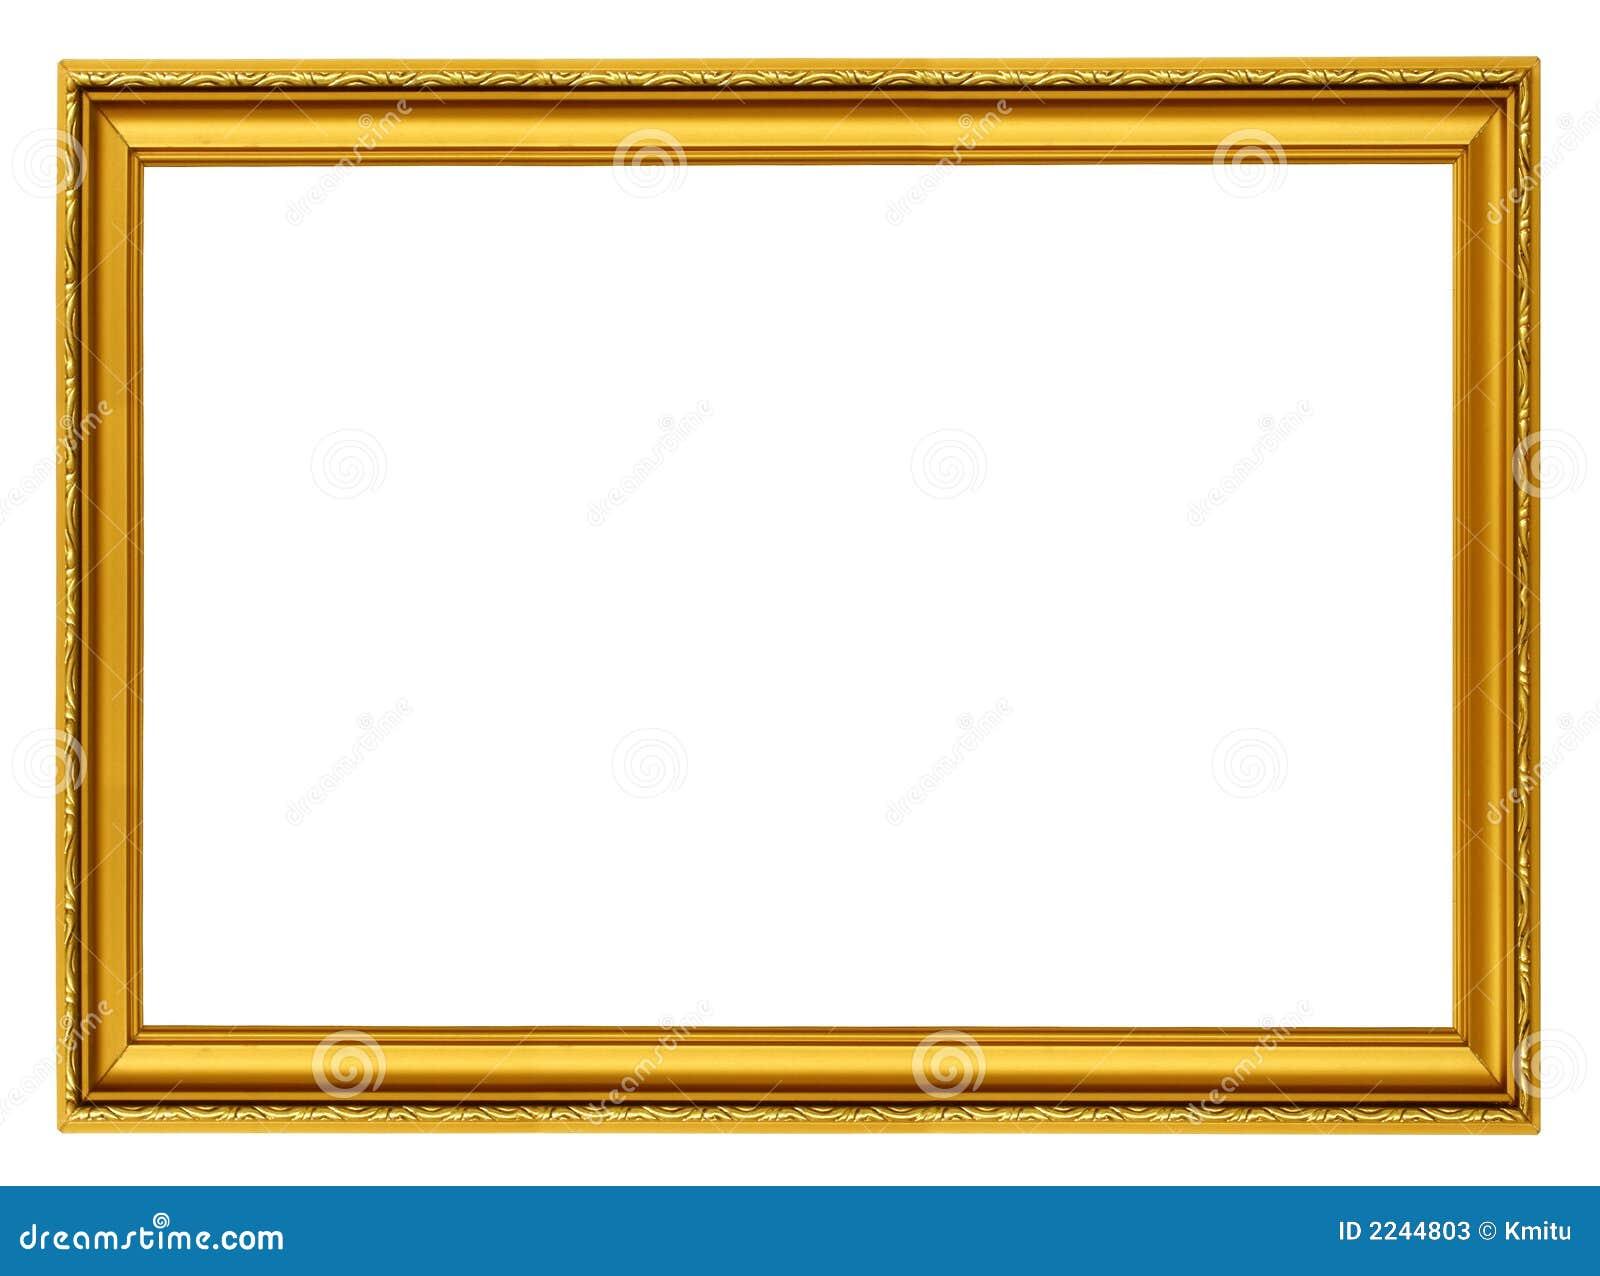 Marco horizontal de oro imagen de archivo. Imagen de envejecido ...